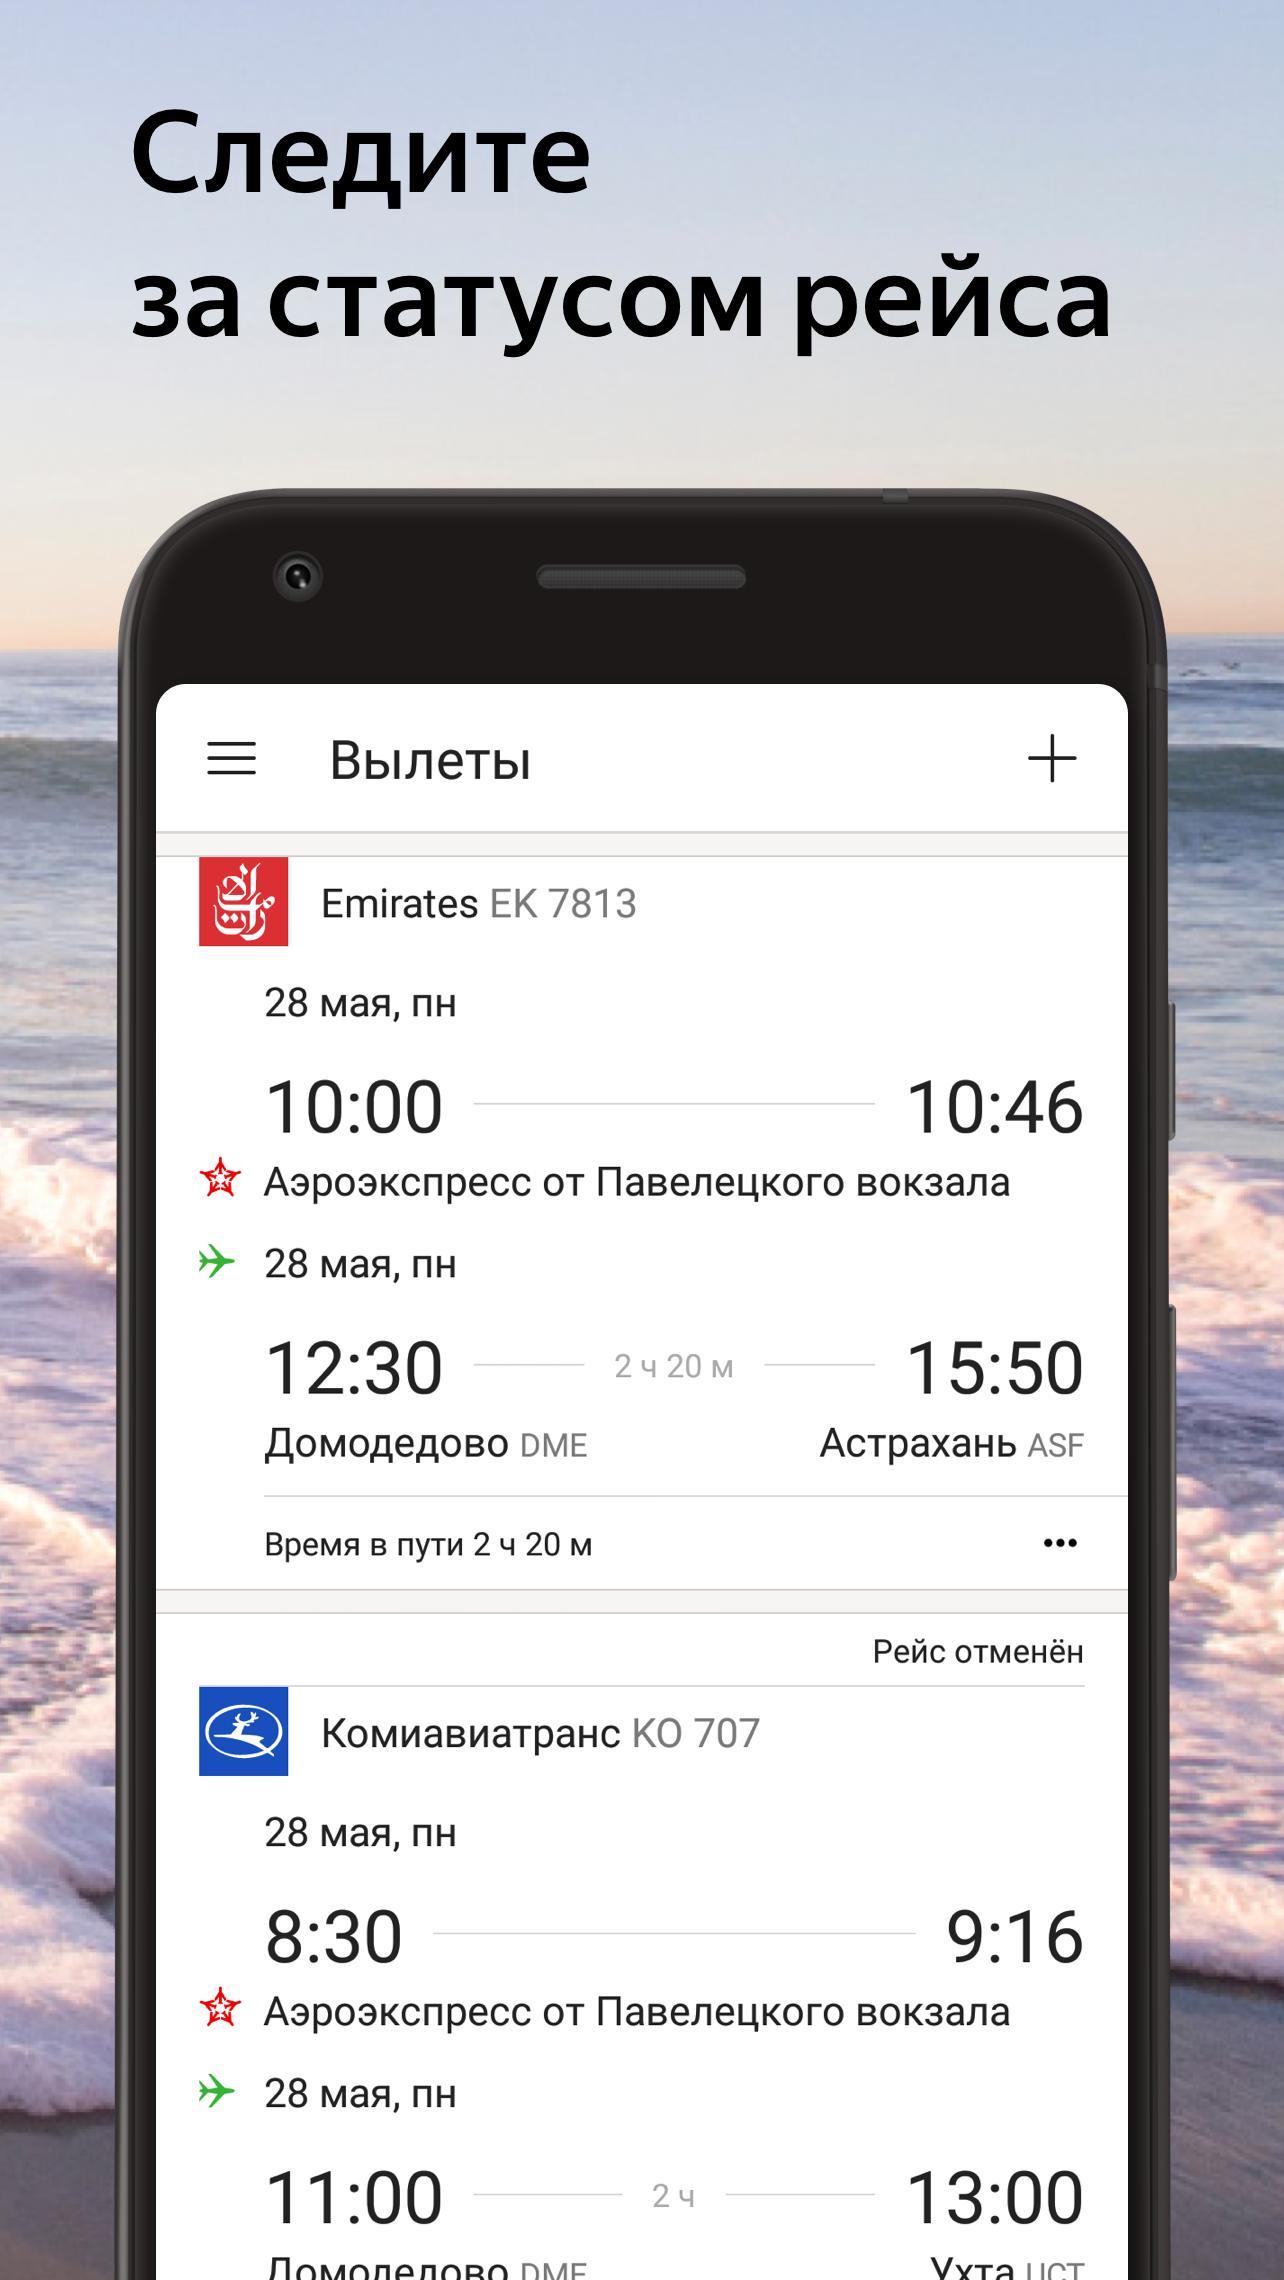 Билеты на самолет дешево на яндексе купить билеты на самолет по дням недели